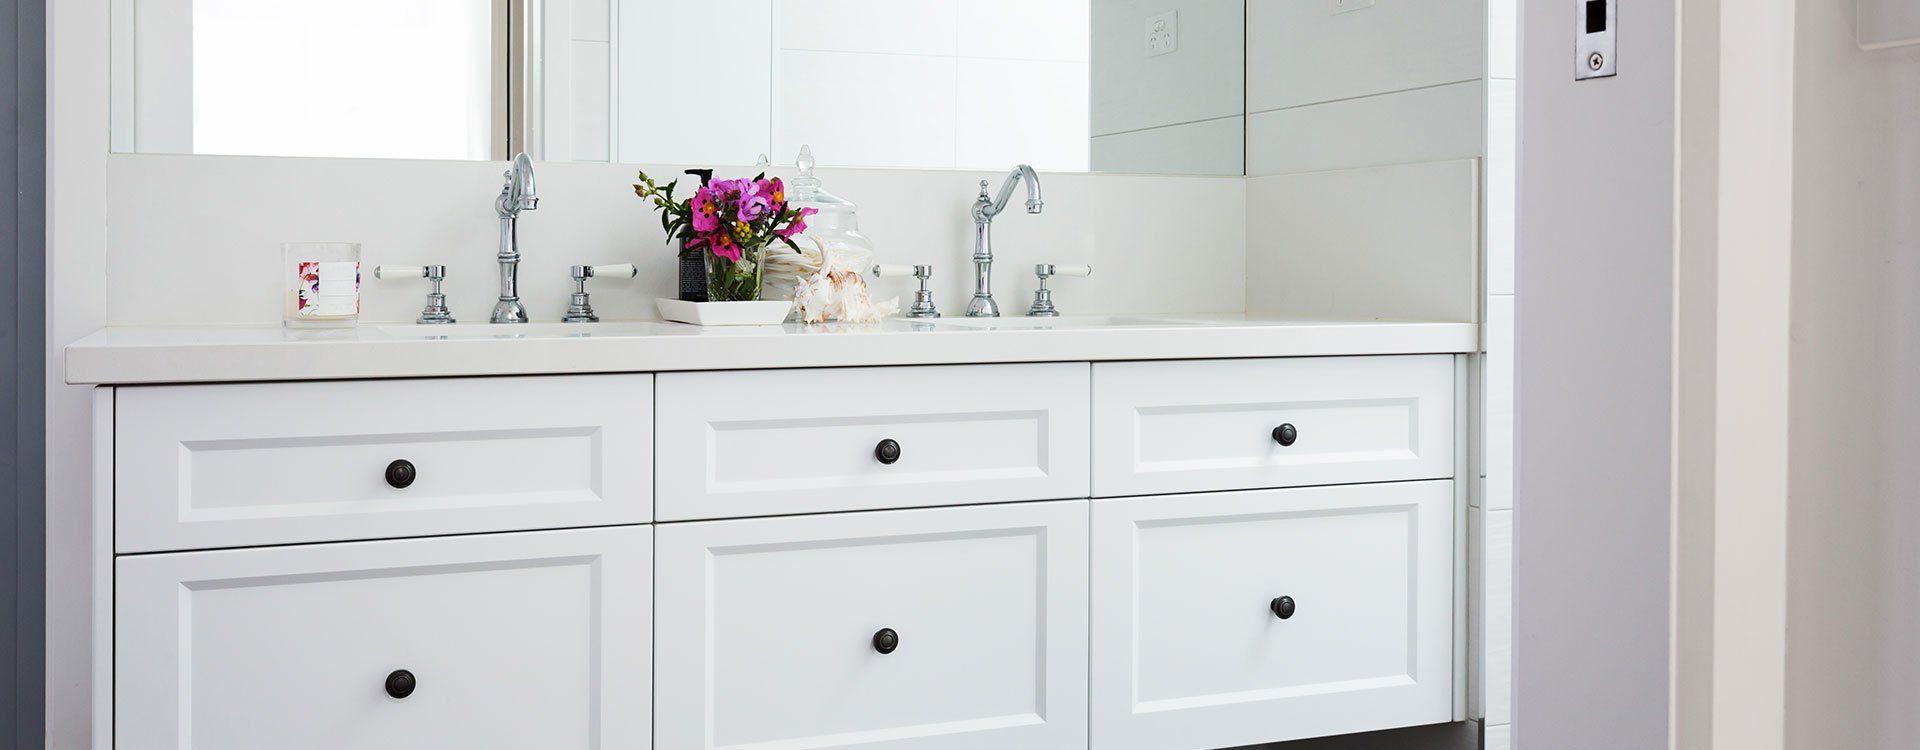 Relianzi Brisbane Bathroom Renovators Slider 1